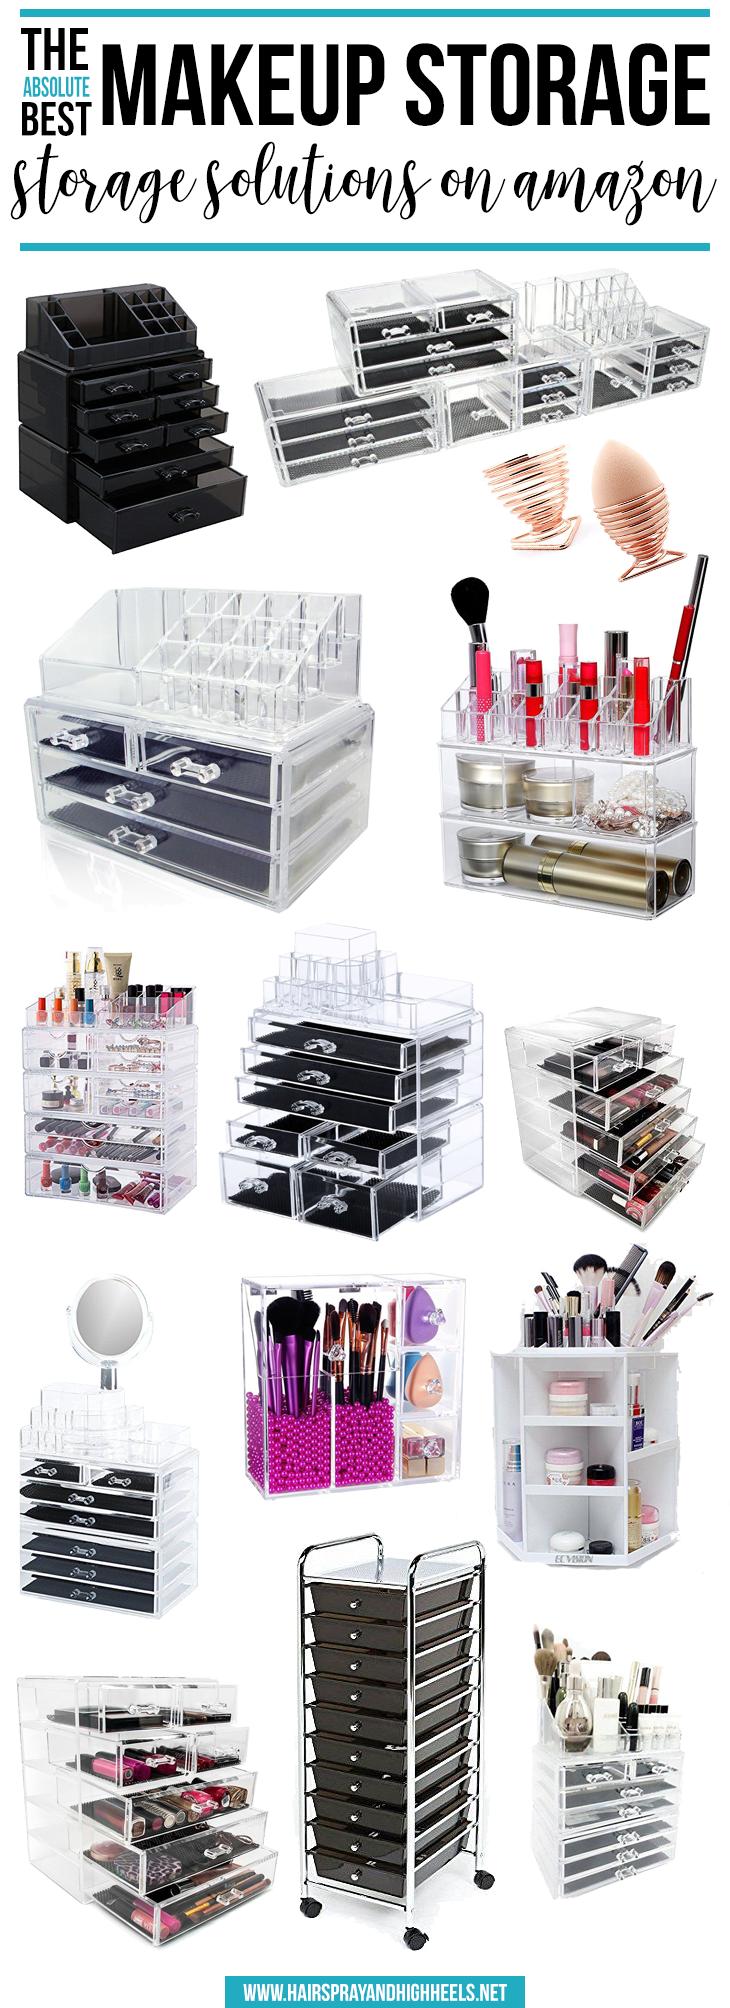 best makeup storage on amazon maquillage rangement et rangements maquillage. Black Bedroom Furniture Sets. Home Design Ideas